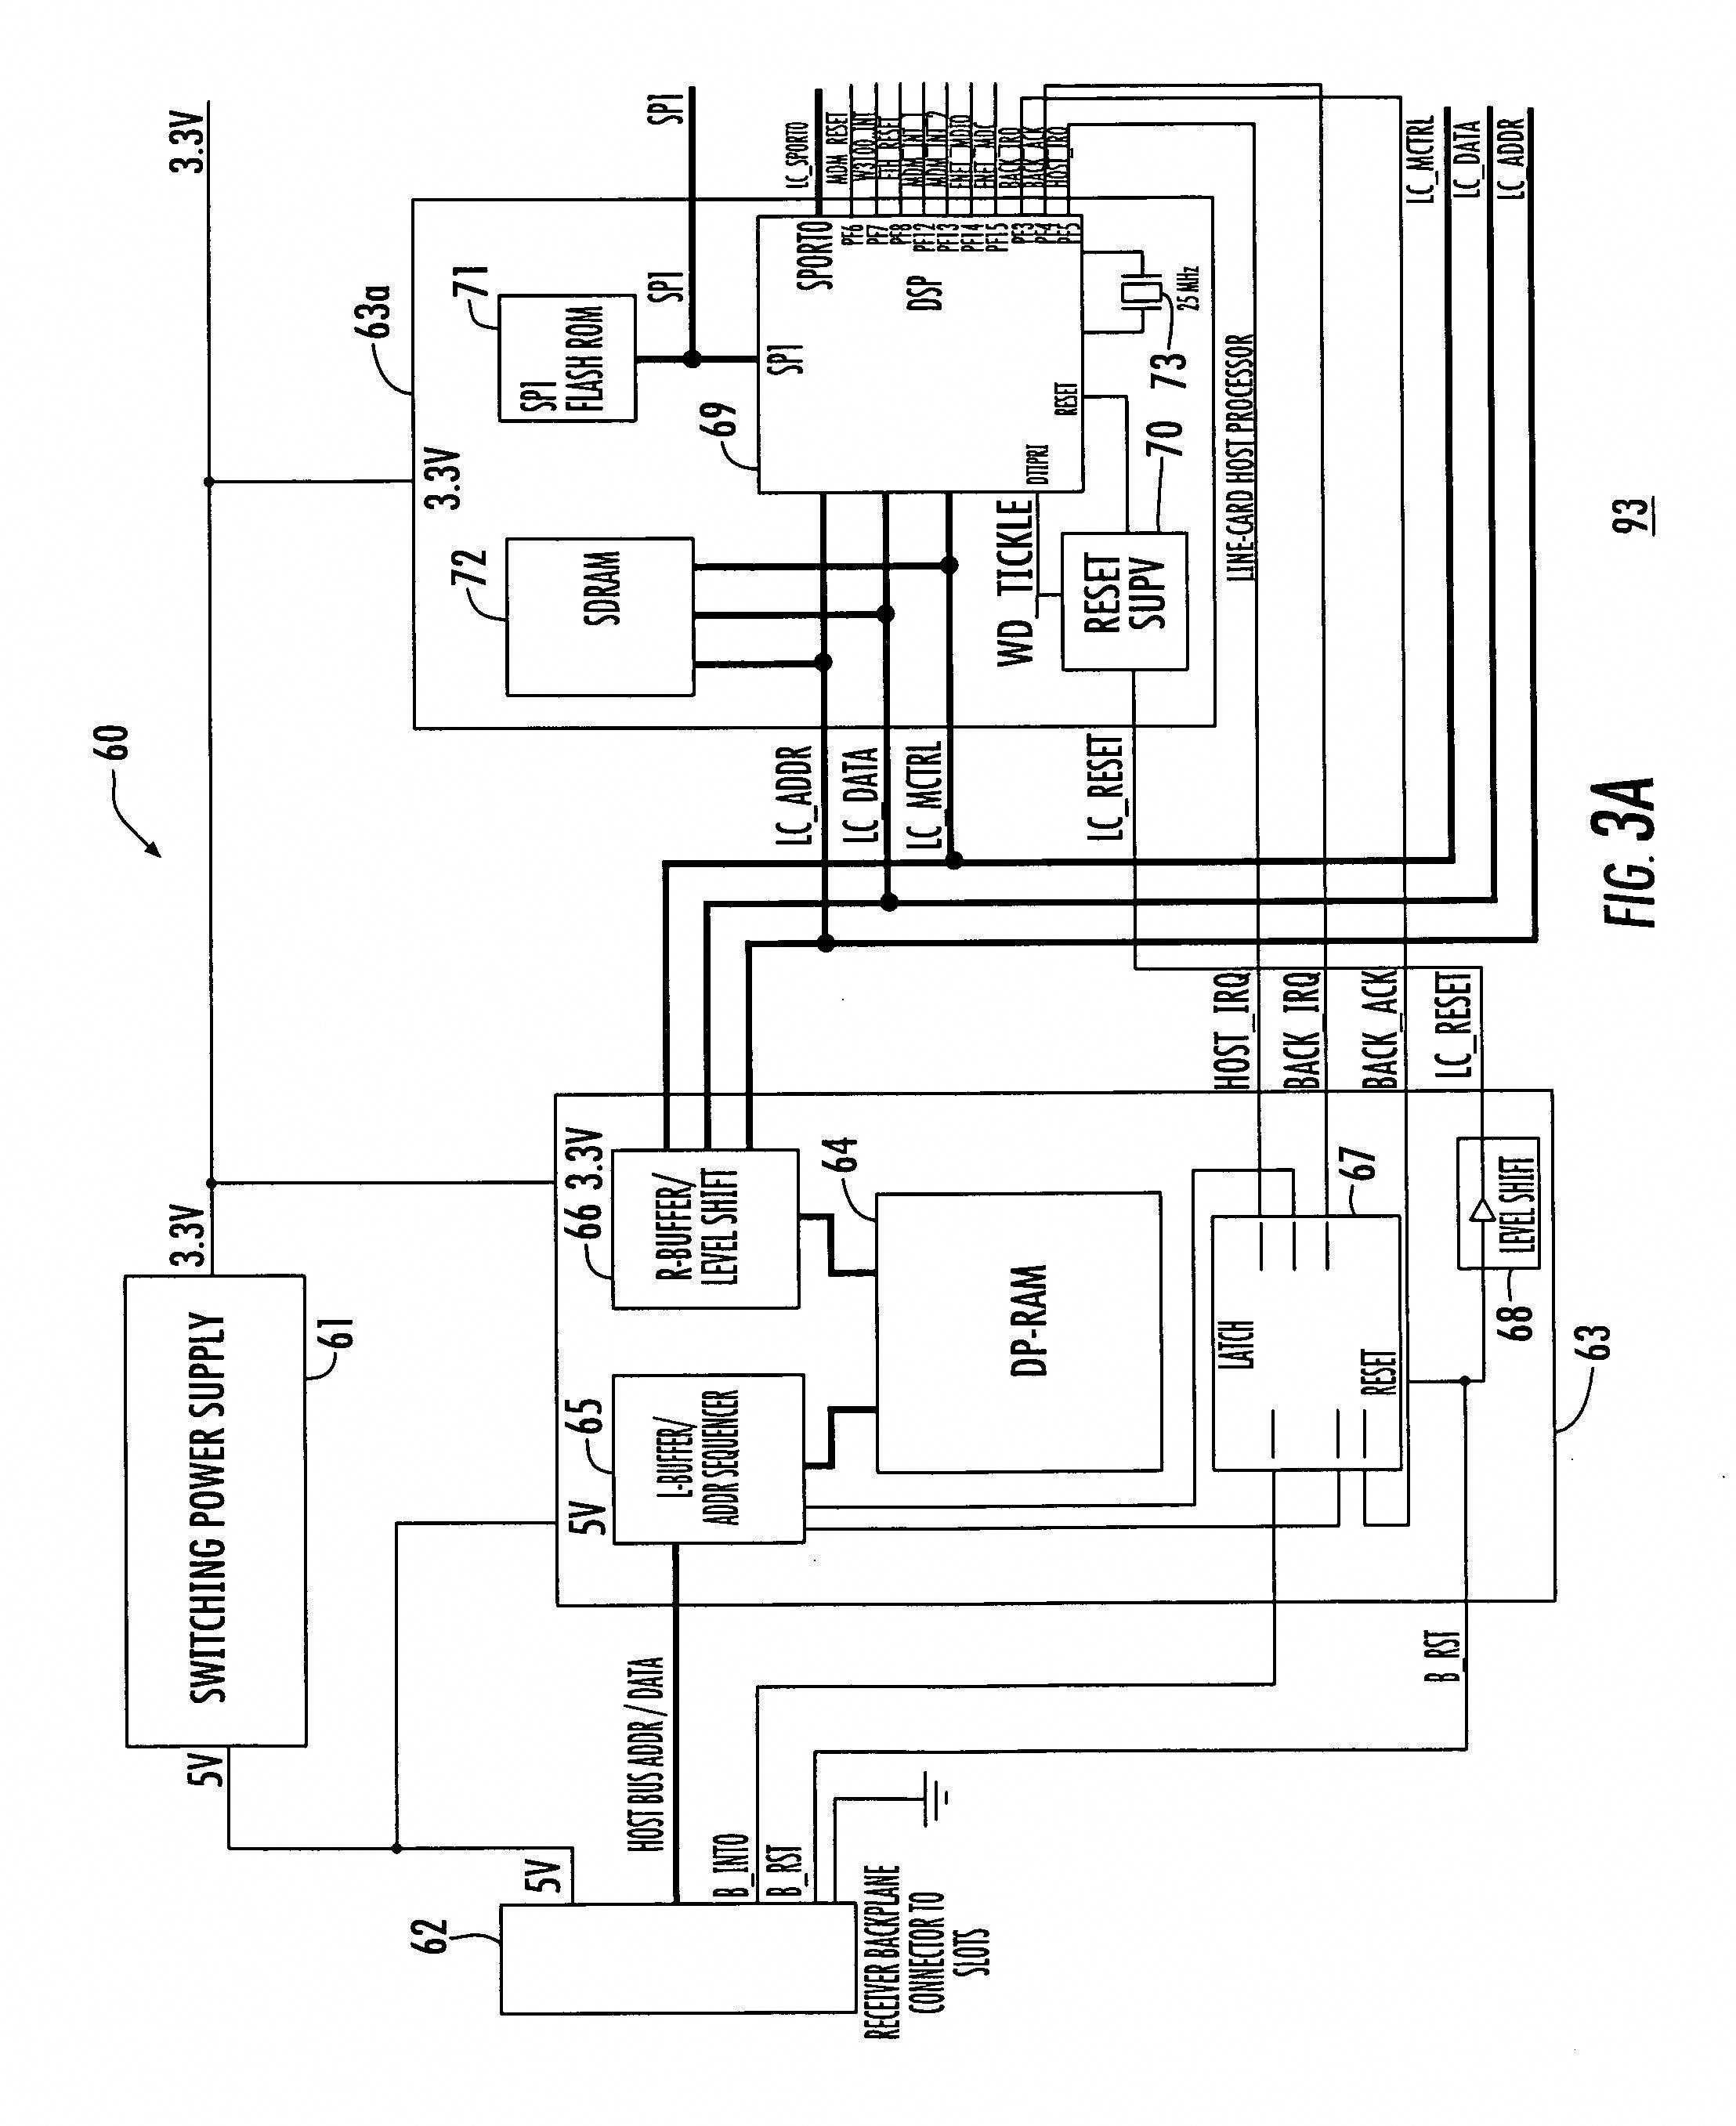 Unique Automotive Wiring Colours Diagram Wiringdiagram Diagramming Diagramm Visuals Visualisati Sistema De Audio Jeep Grand Cherokee Coches Mercedes Benz